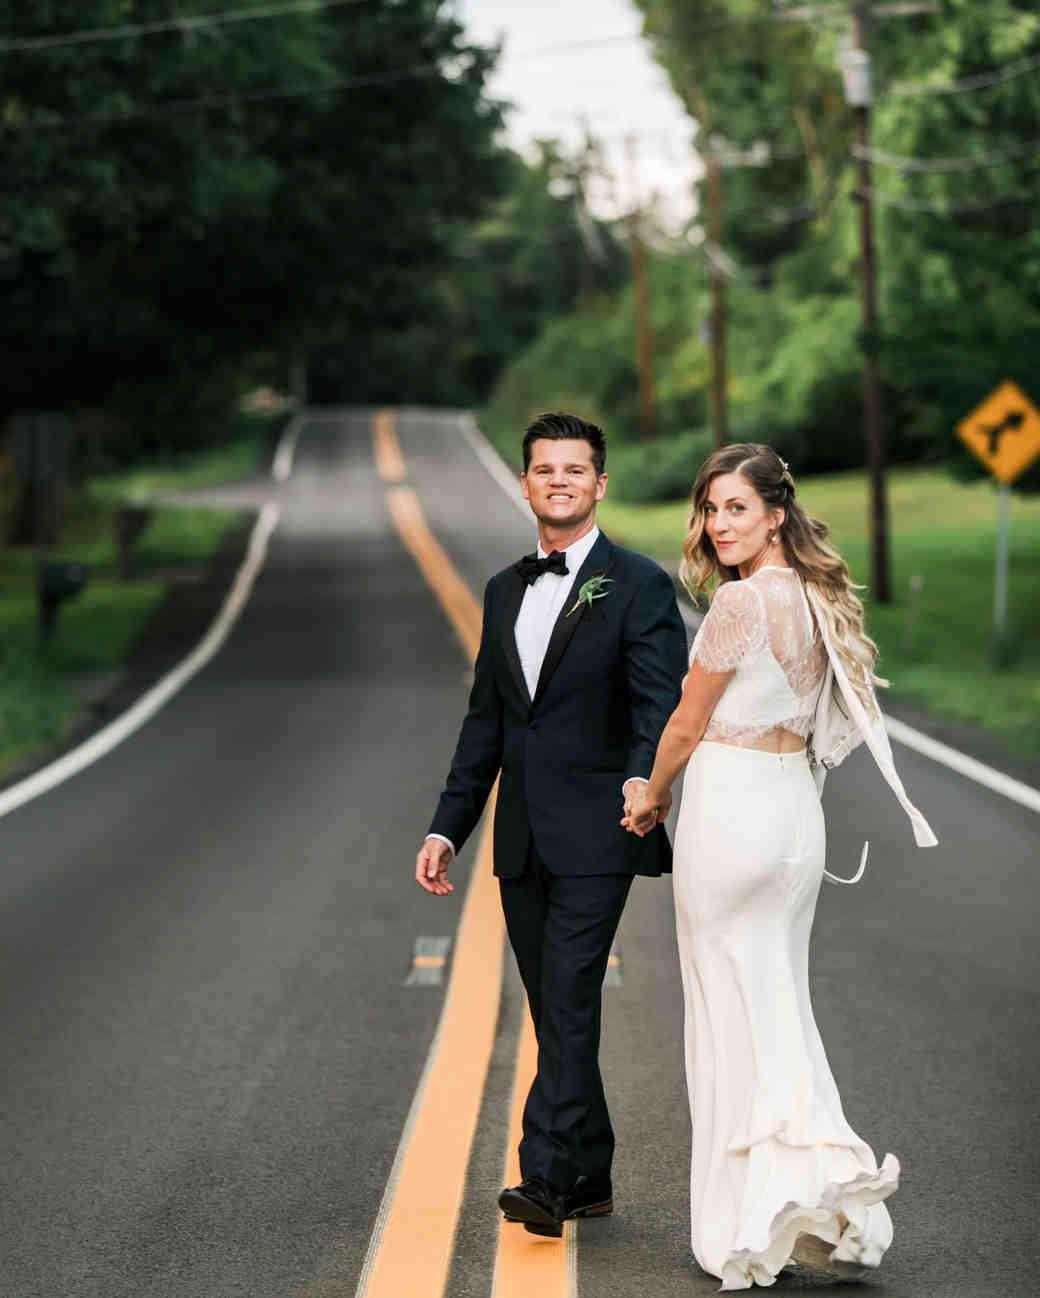 vanessa steven wedding couple road